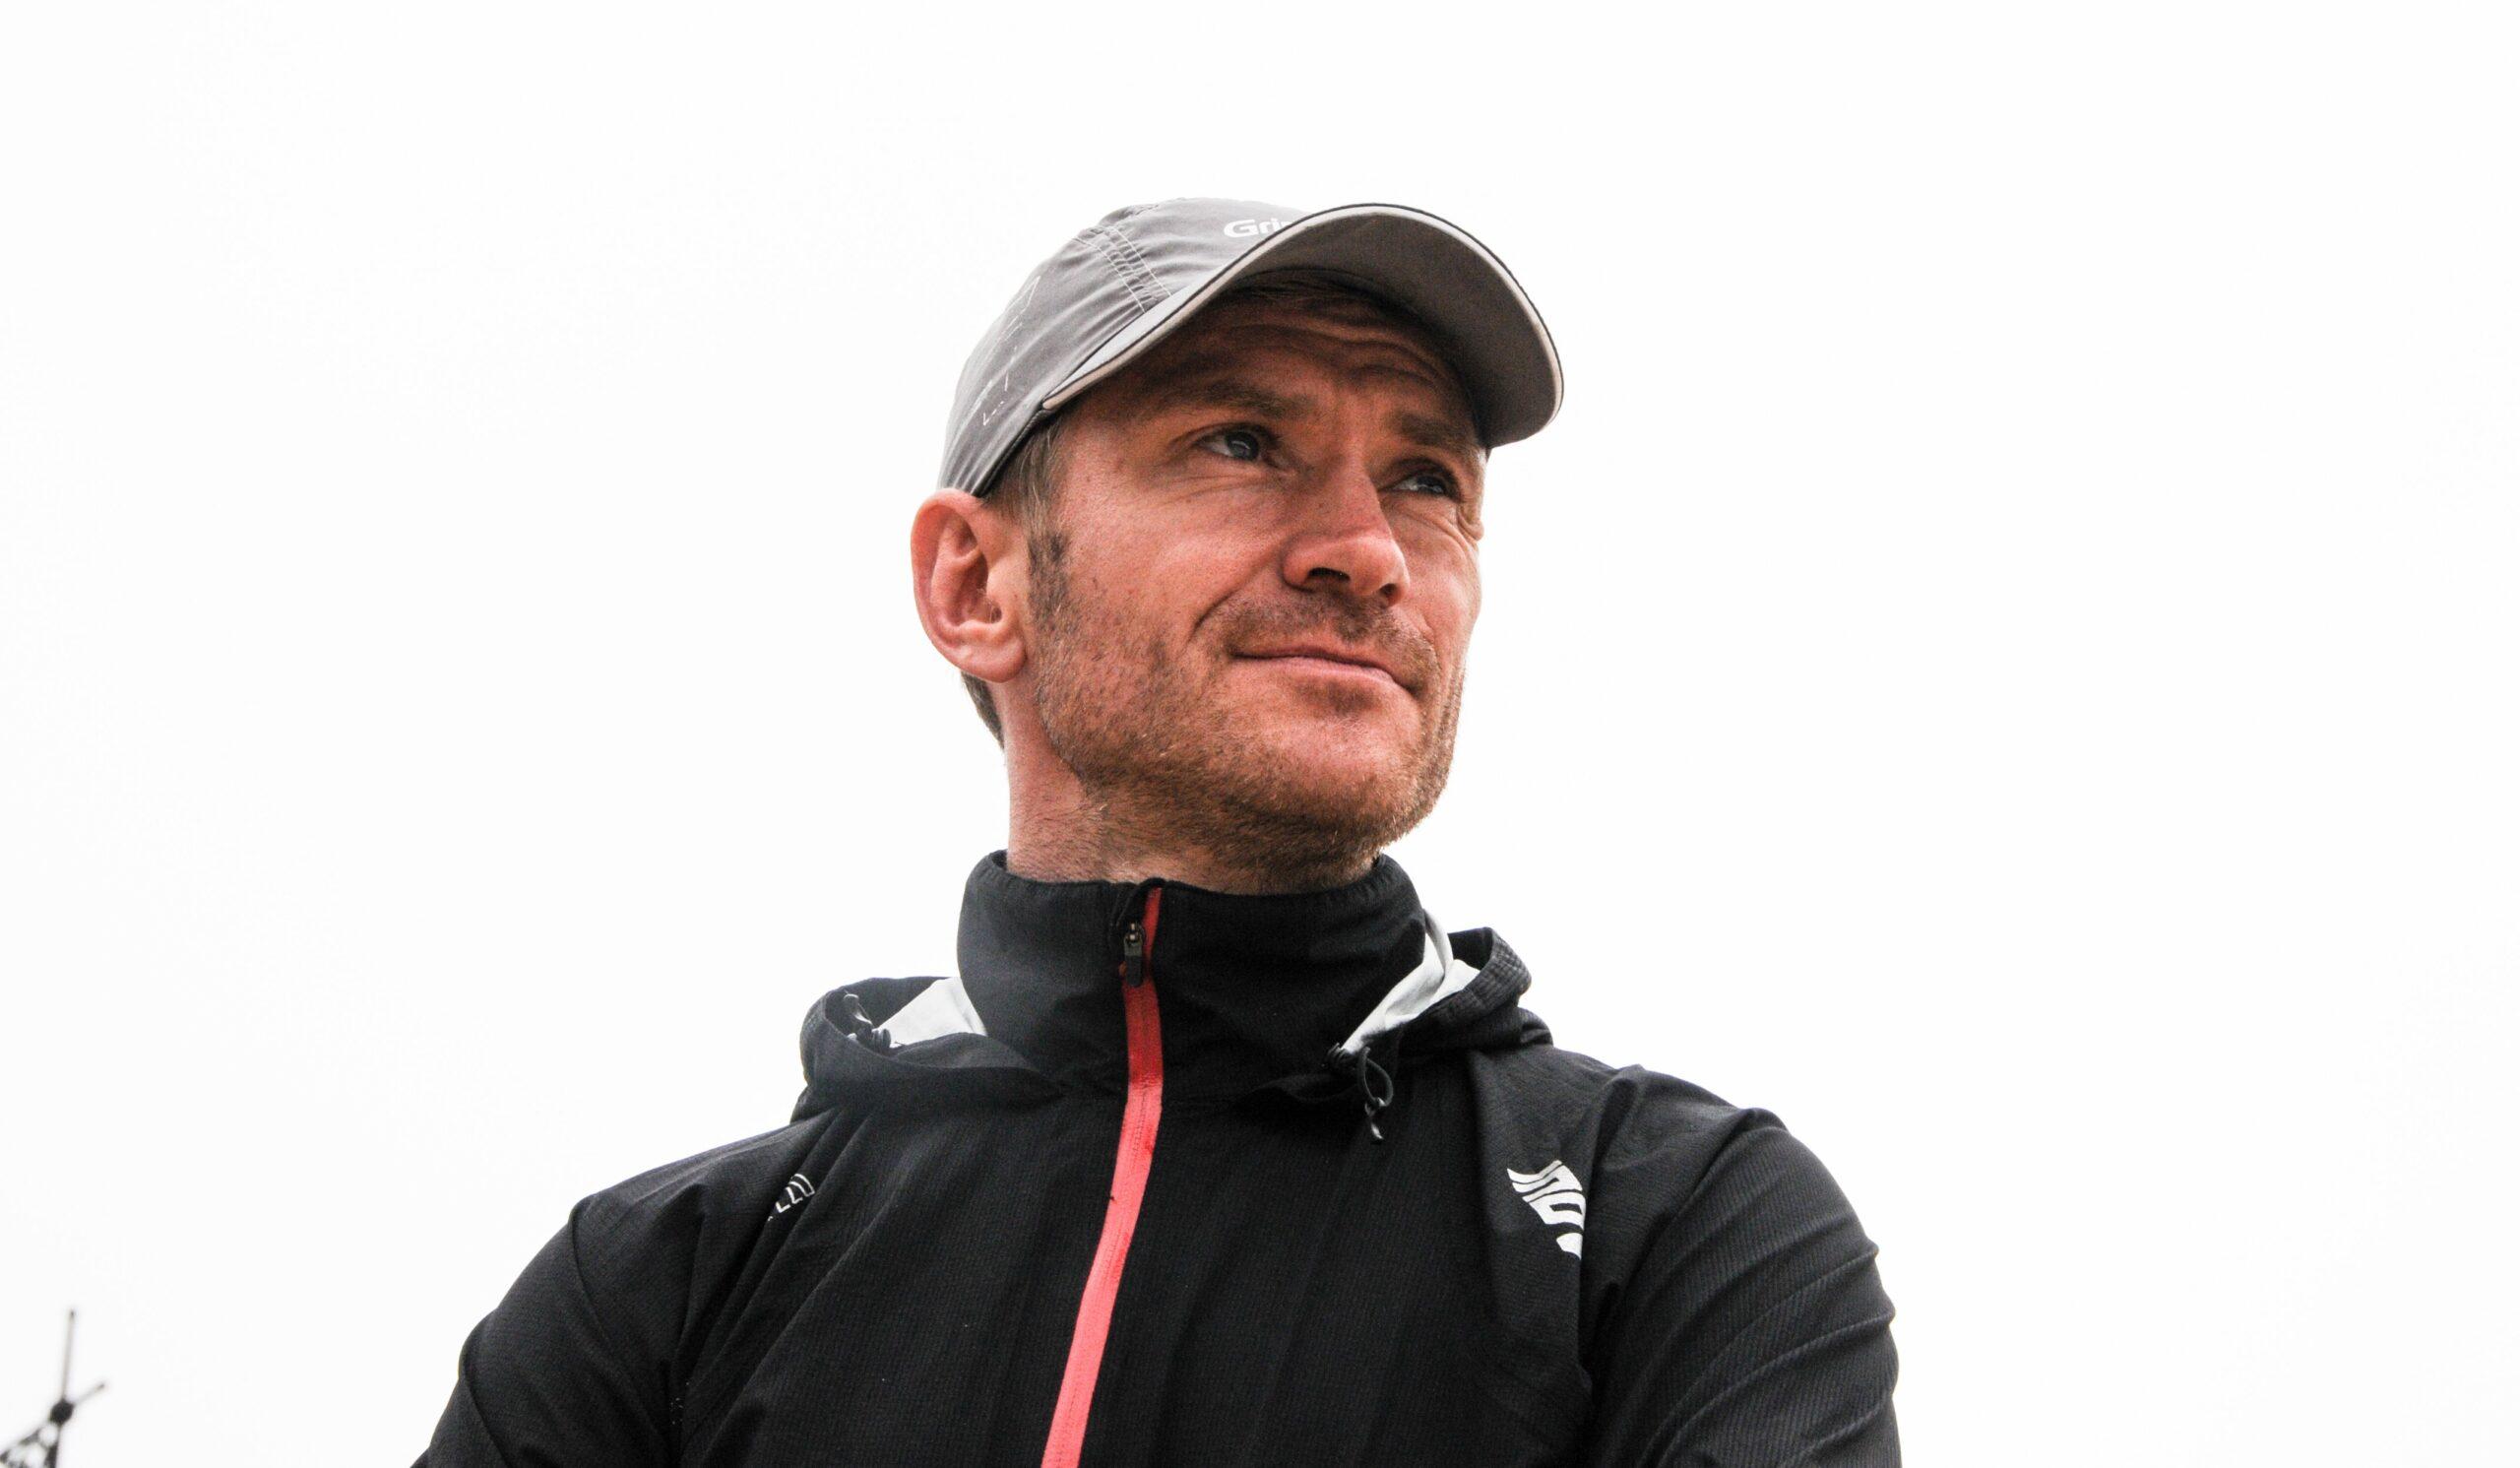 Simon Grimstrup